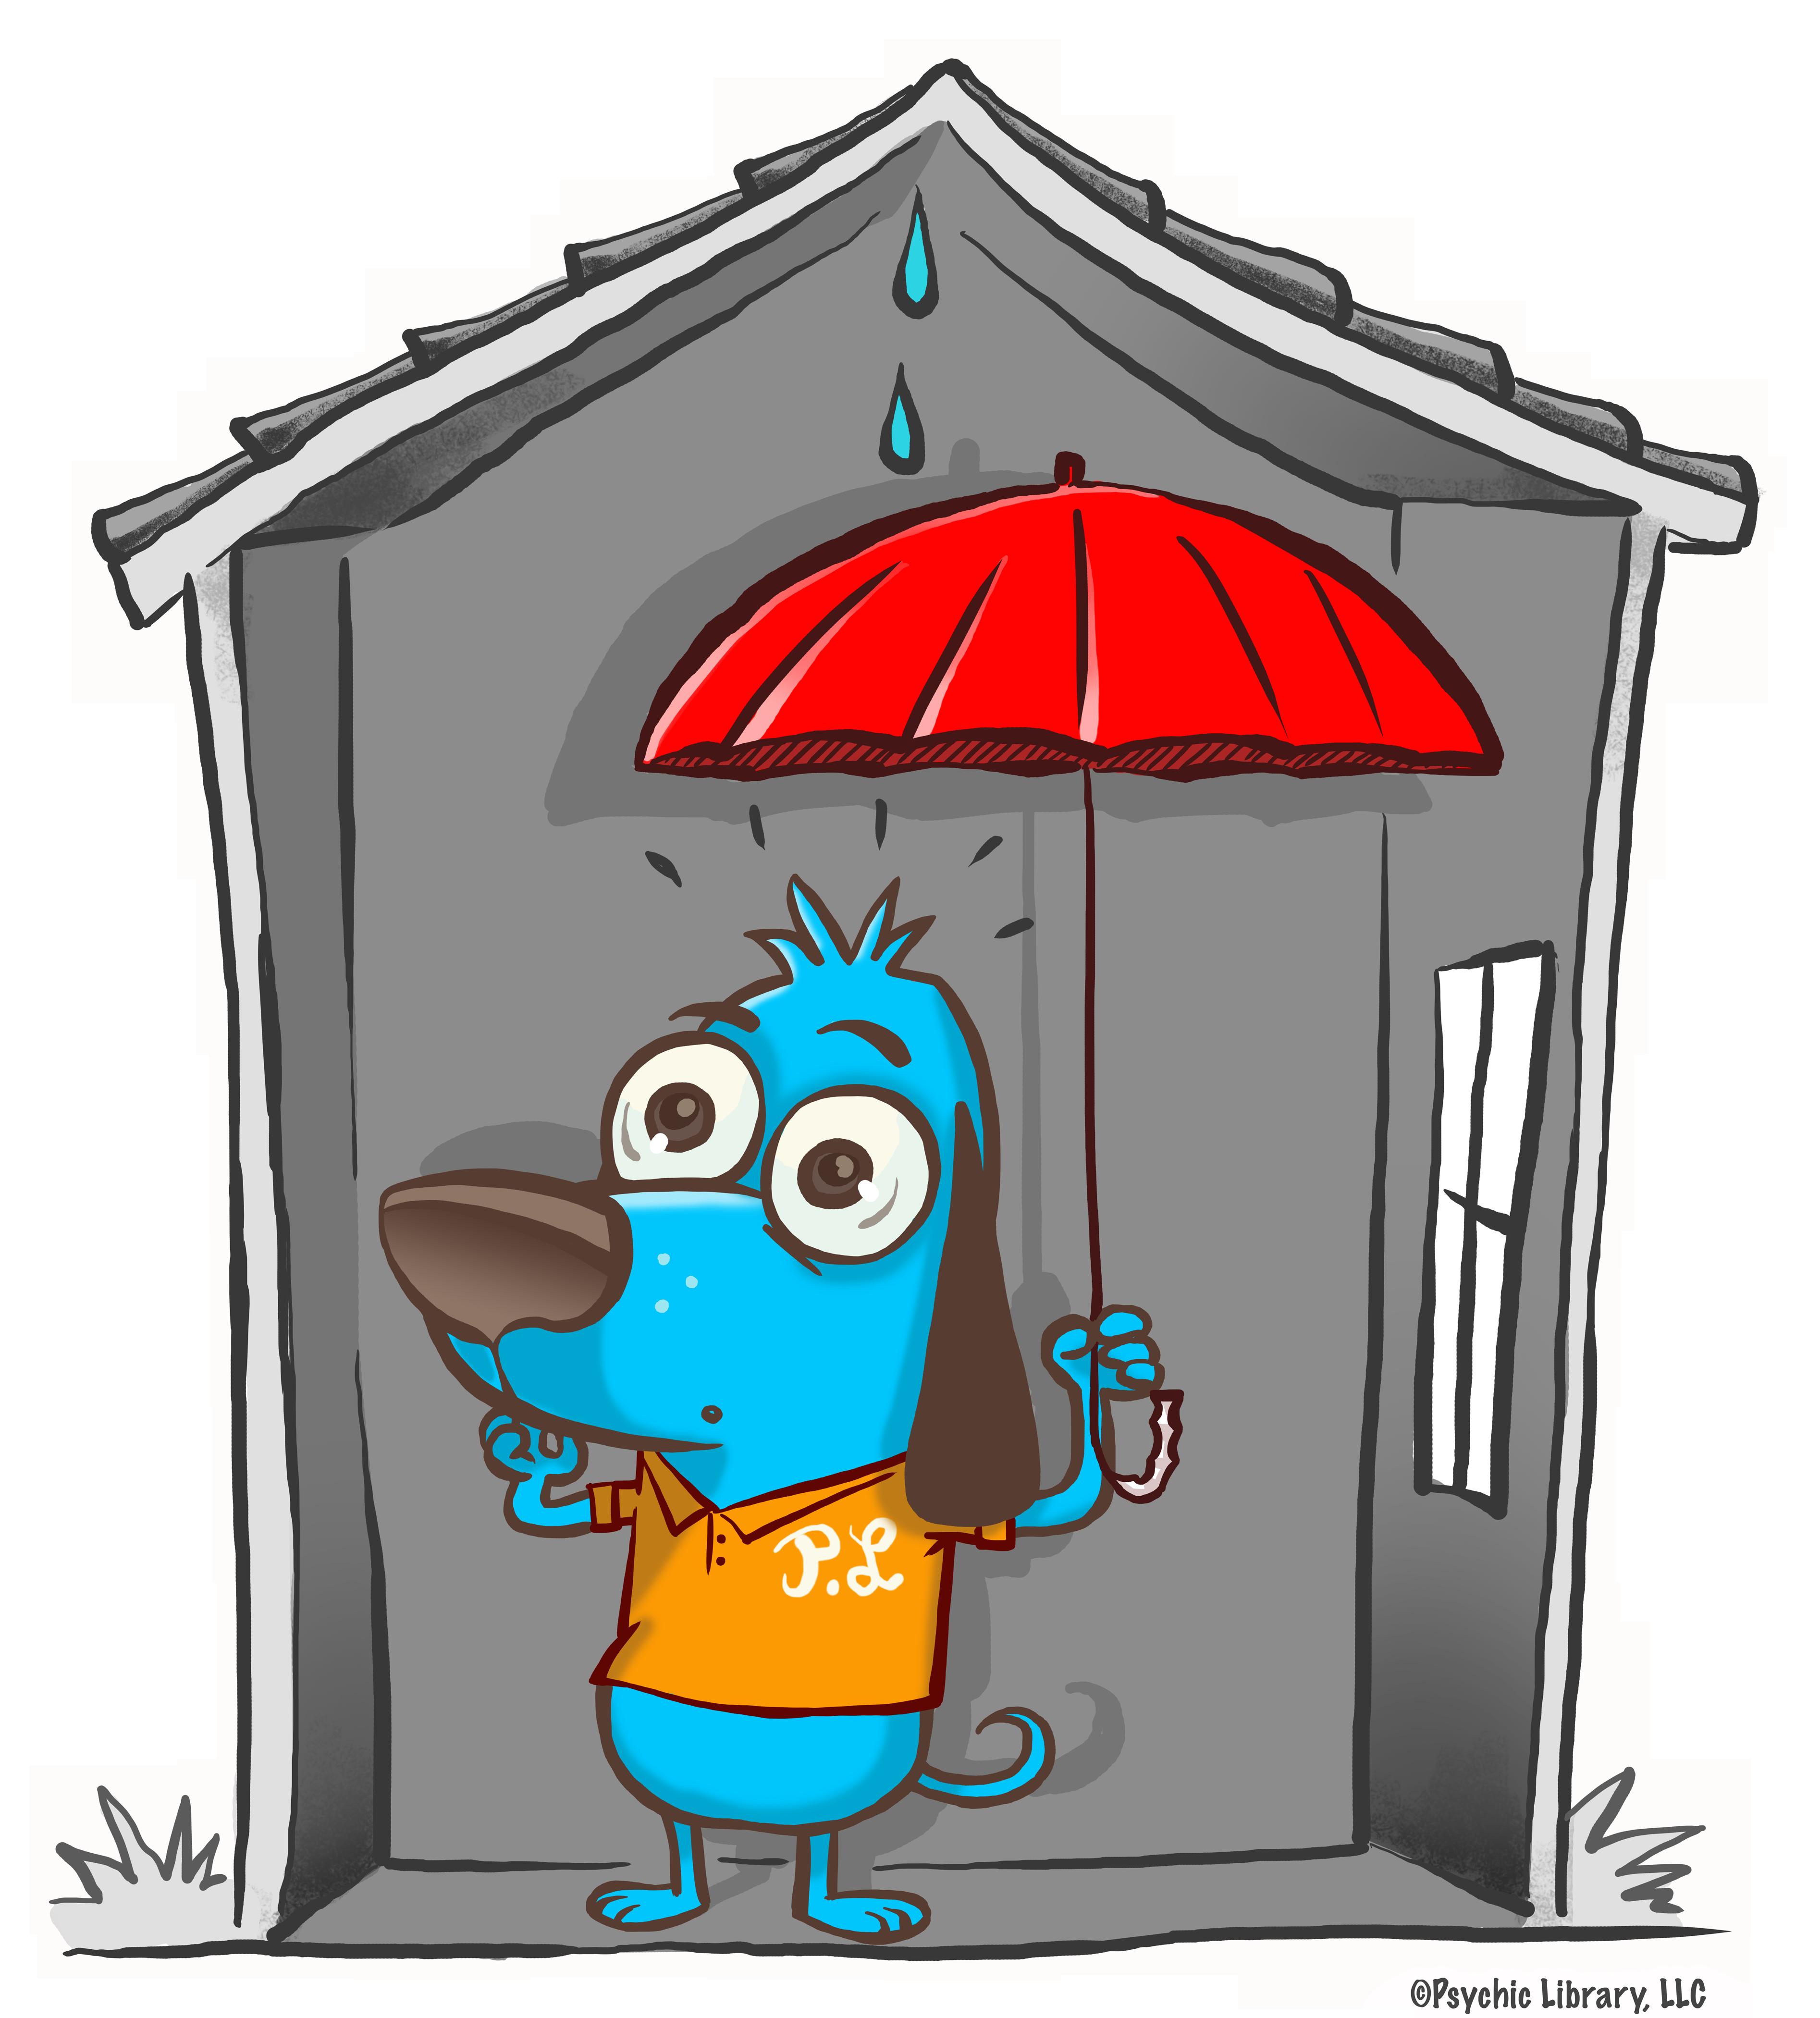 Bad dog dog house clipart